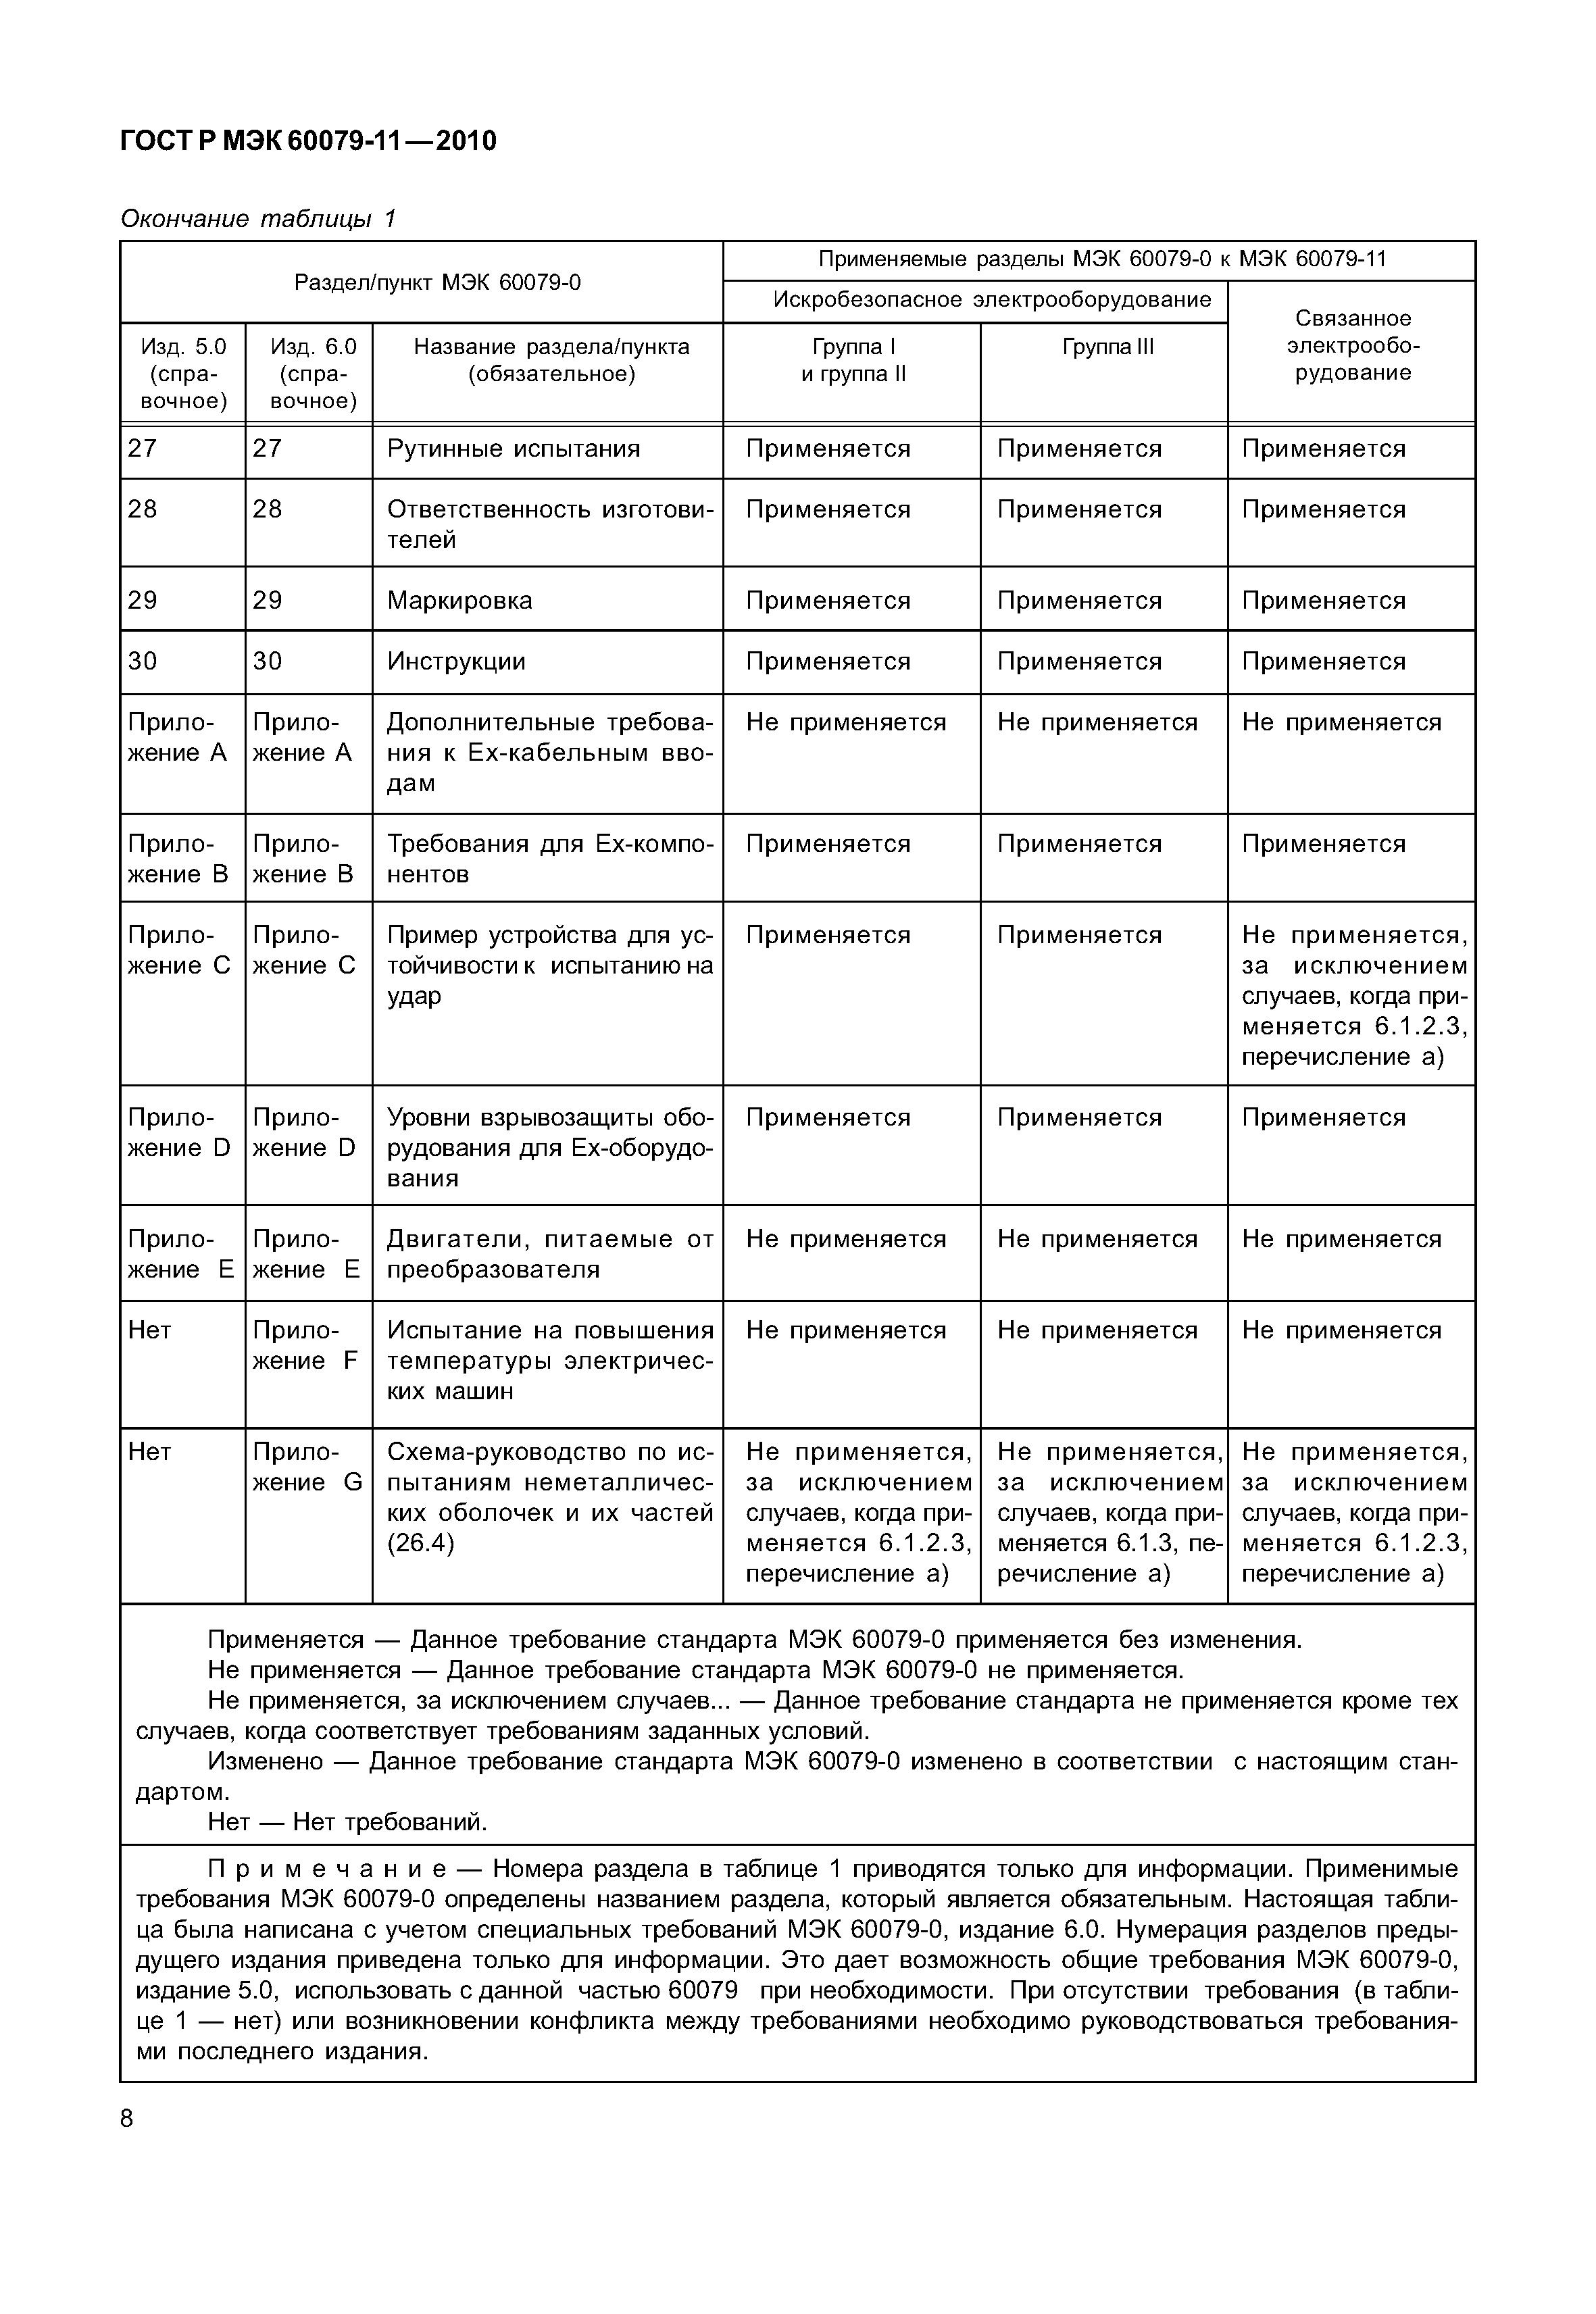 60079 PART 11 PDF DOWNLOAD